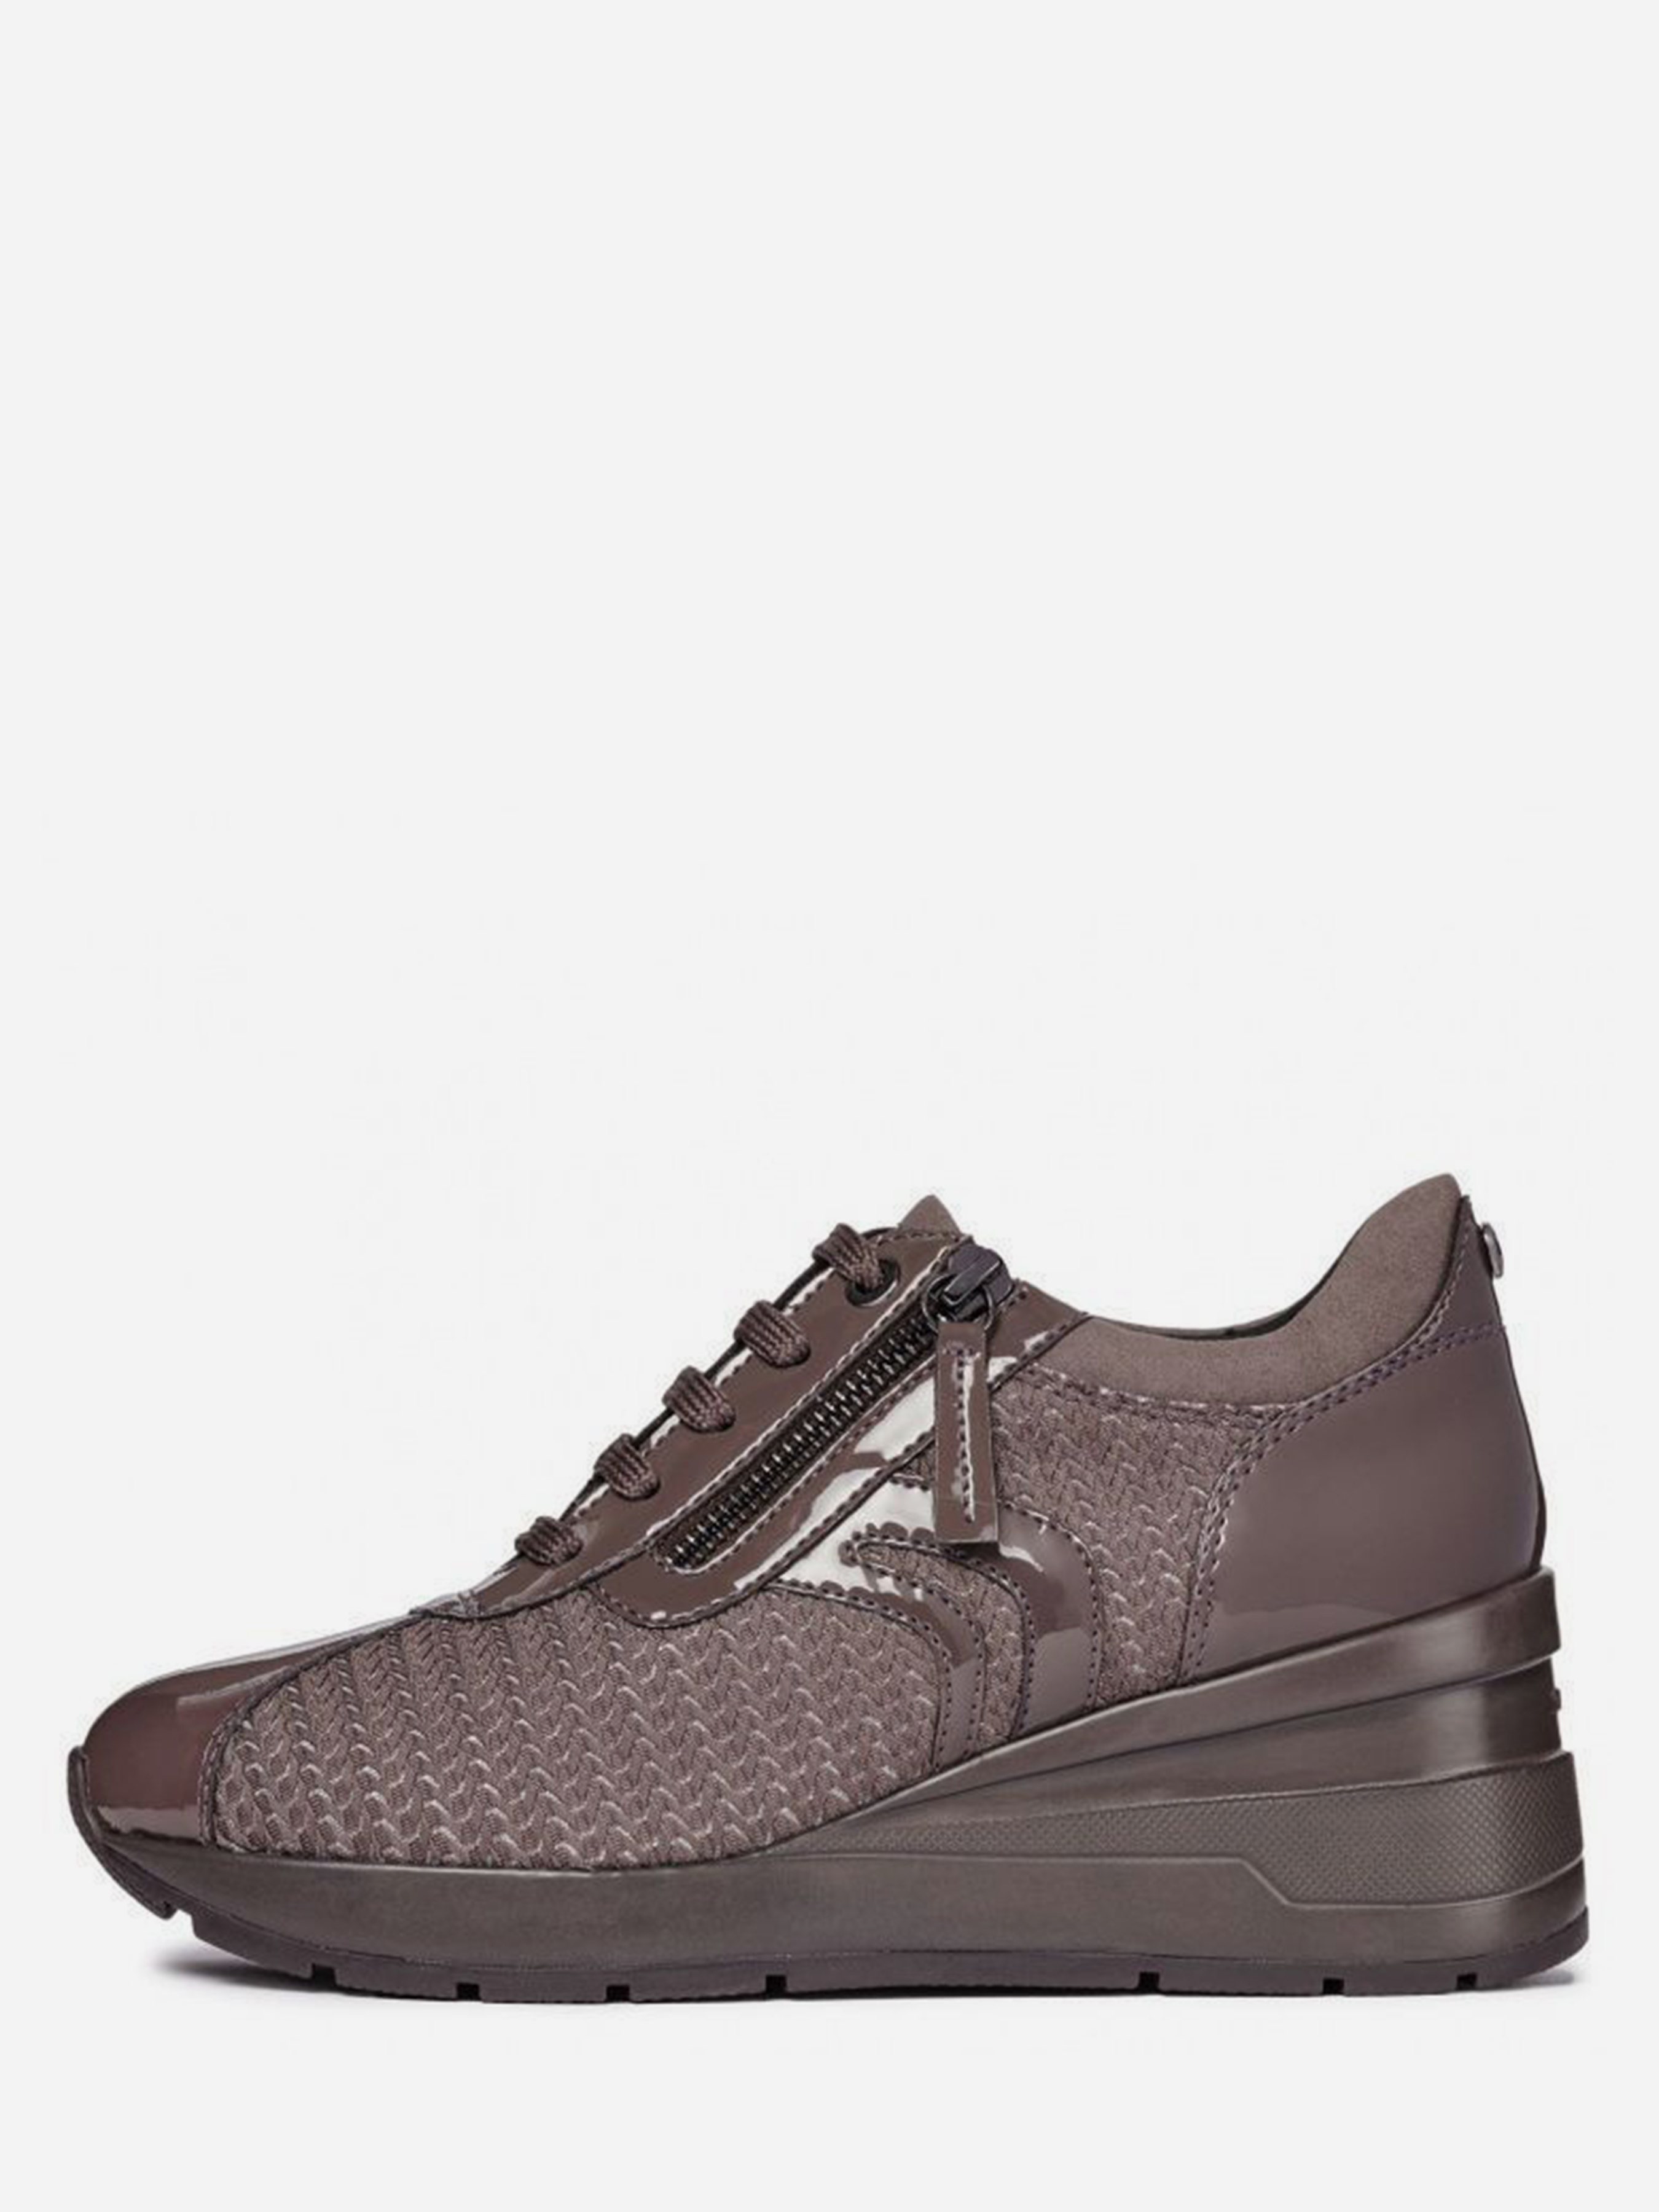 Ботинки для женщин Geox ZOSMA XW3364 стоимость, 2017